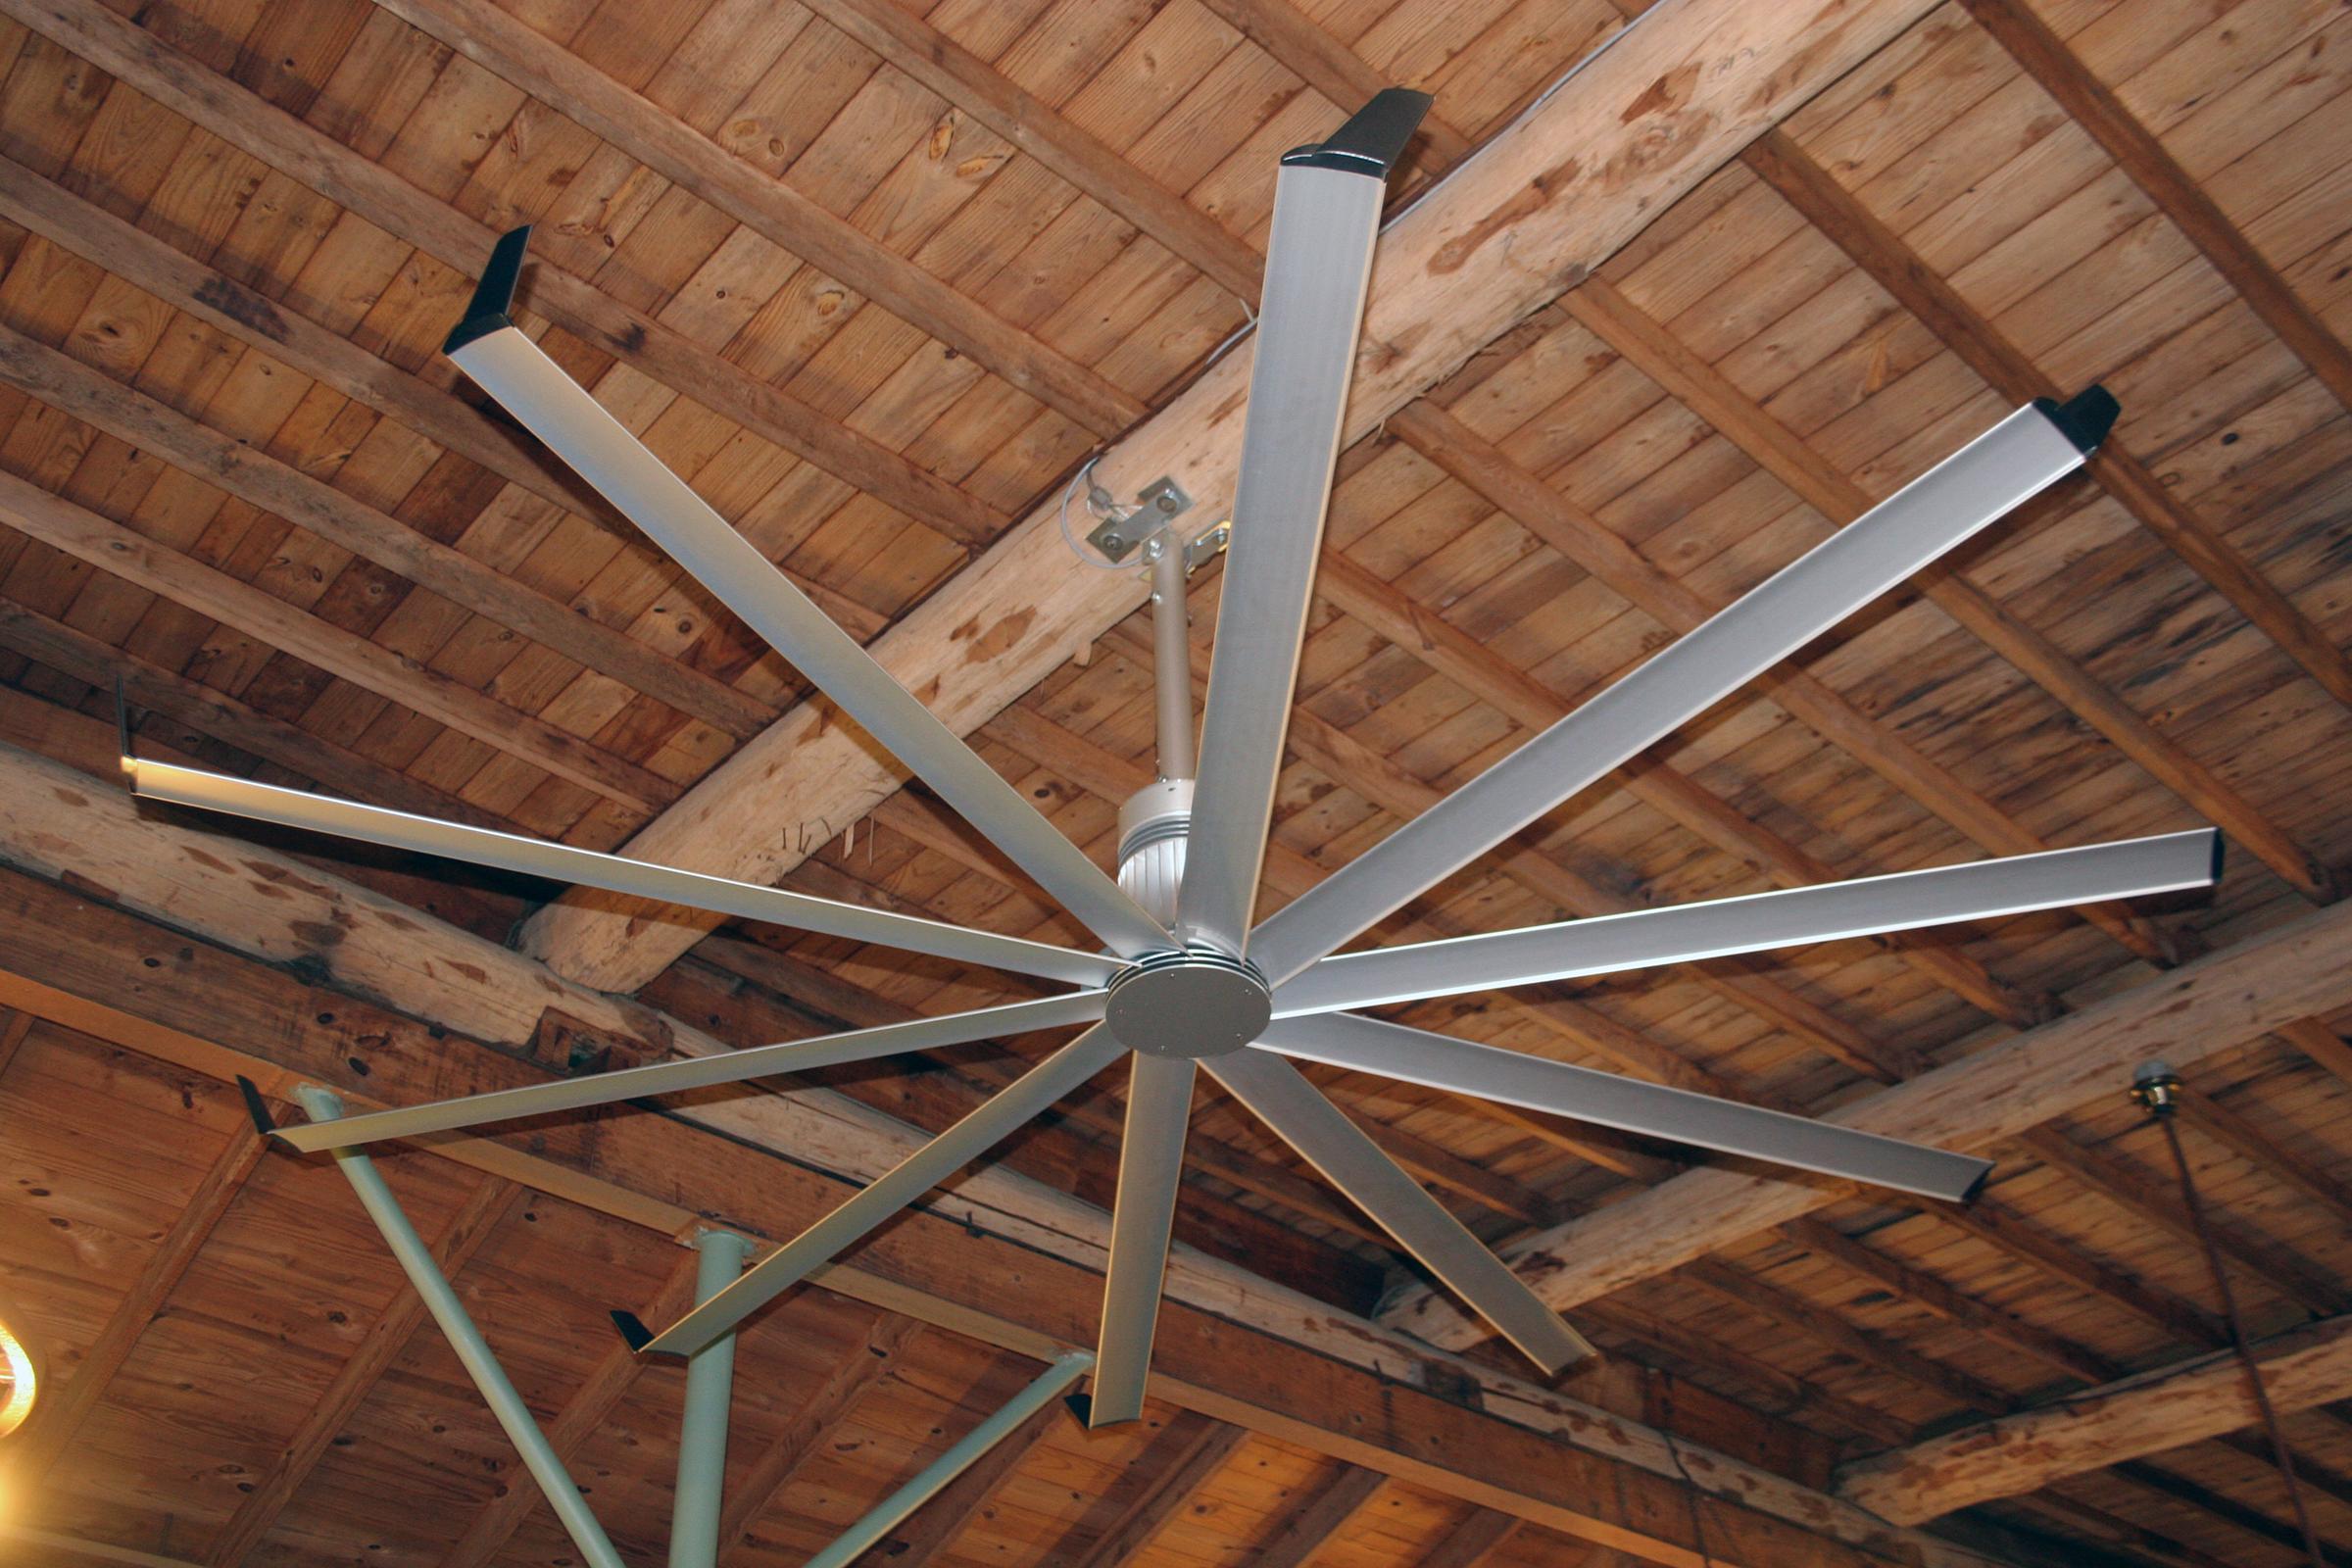 isis ceiling fan photo - 4